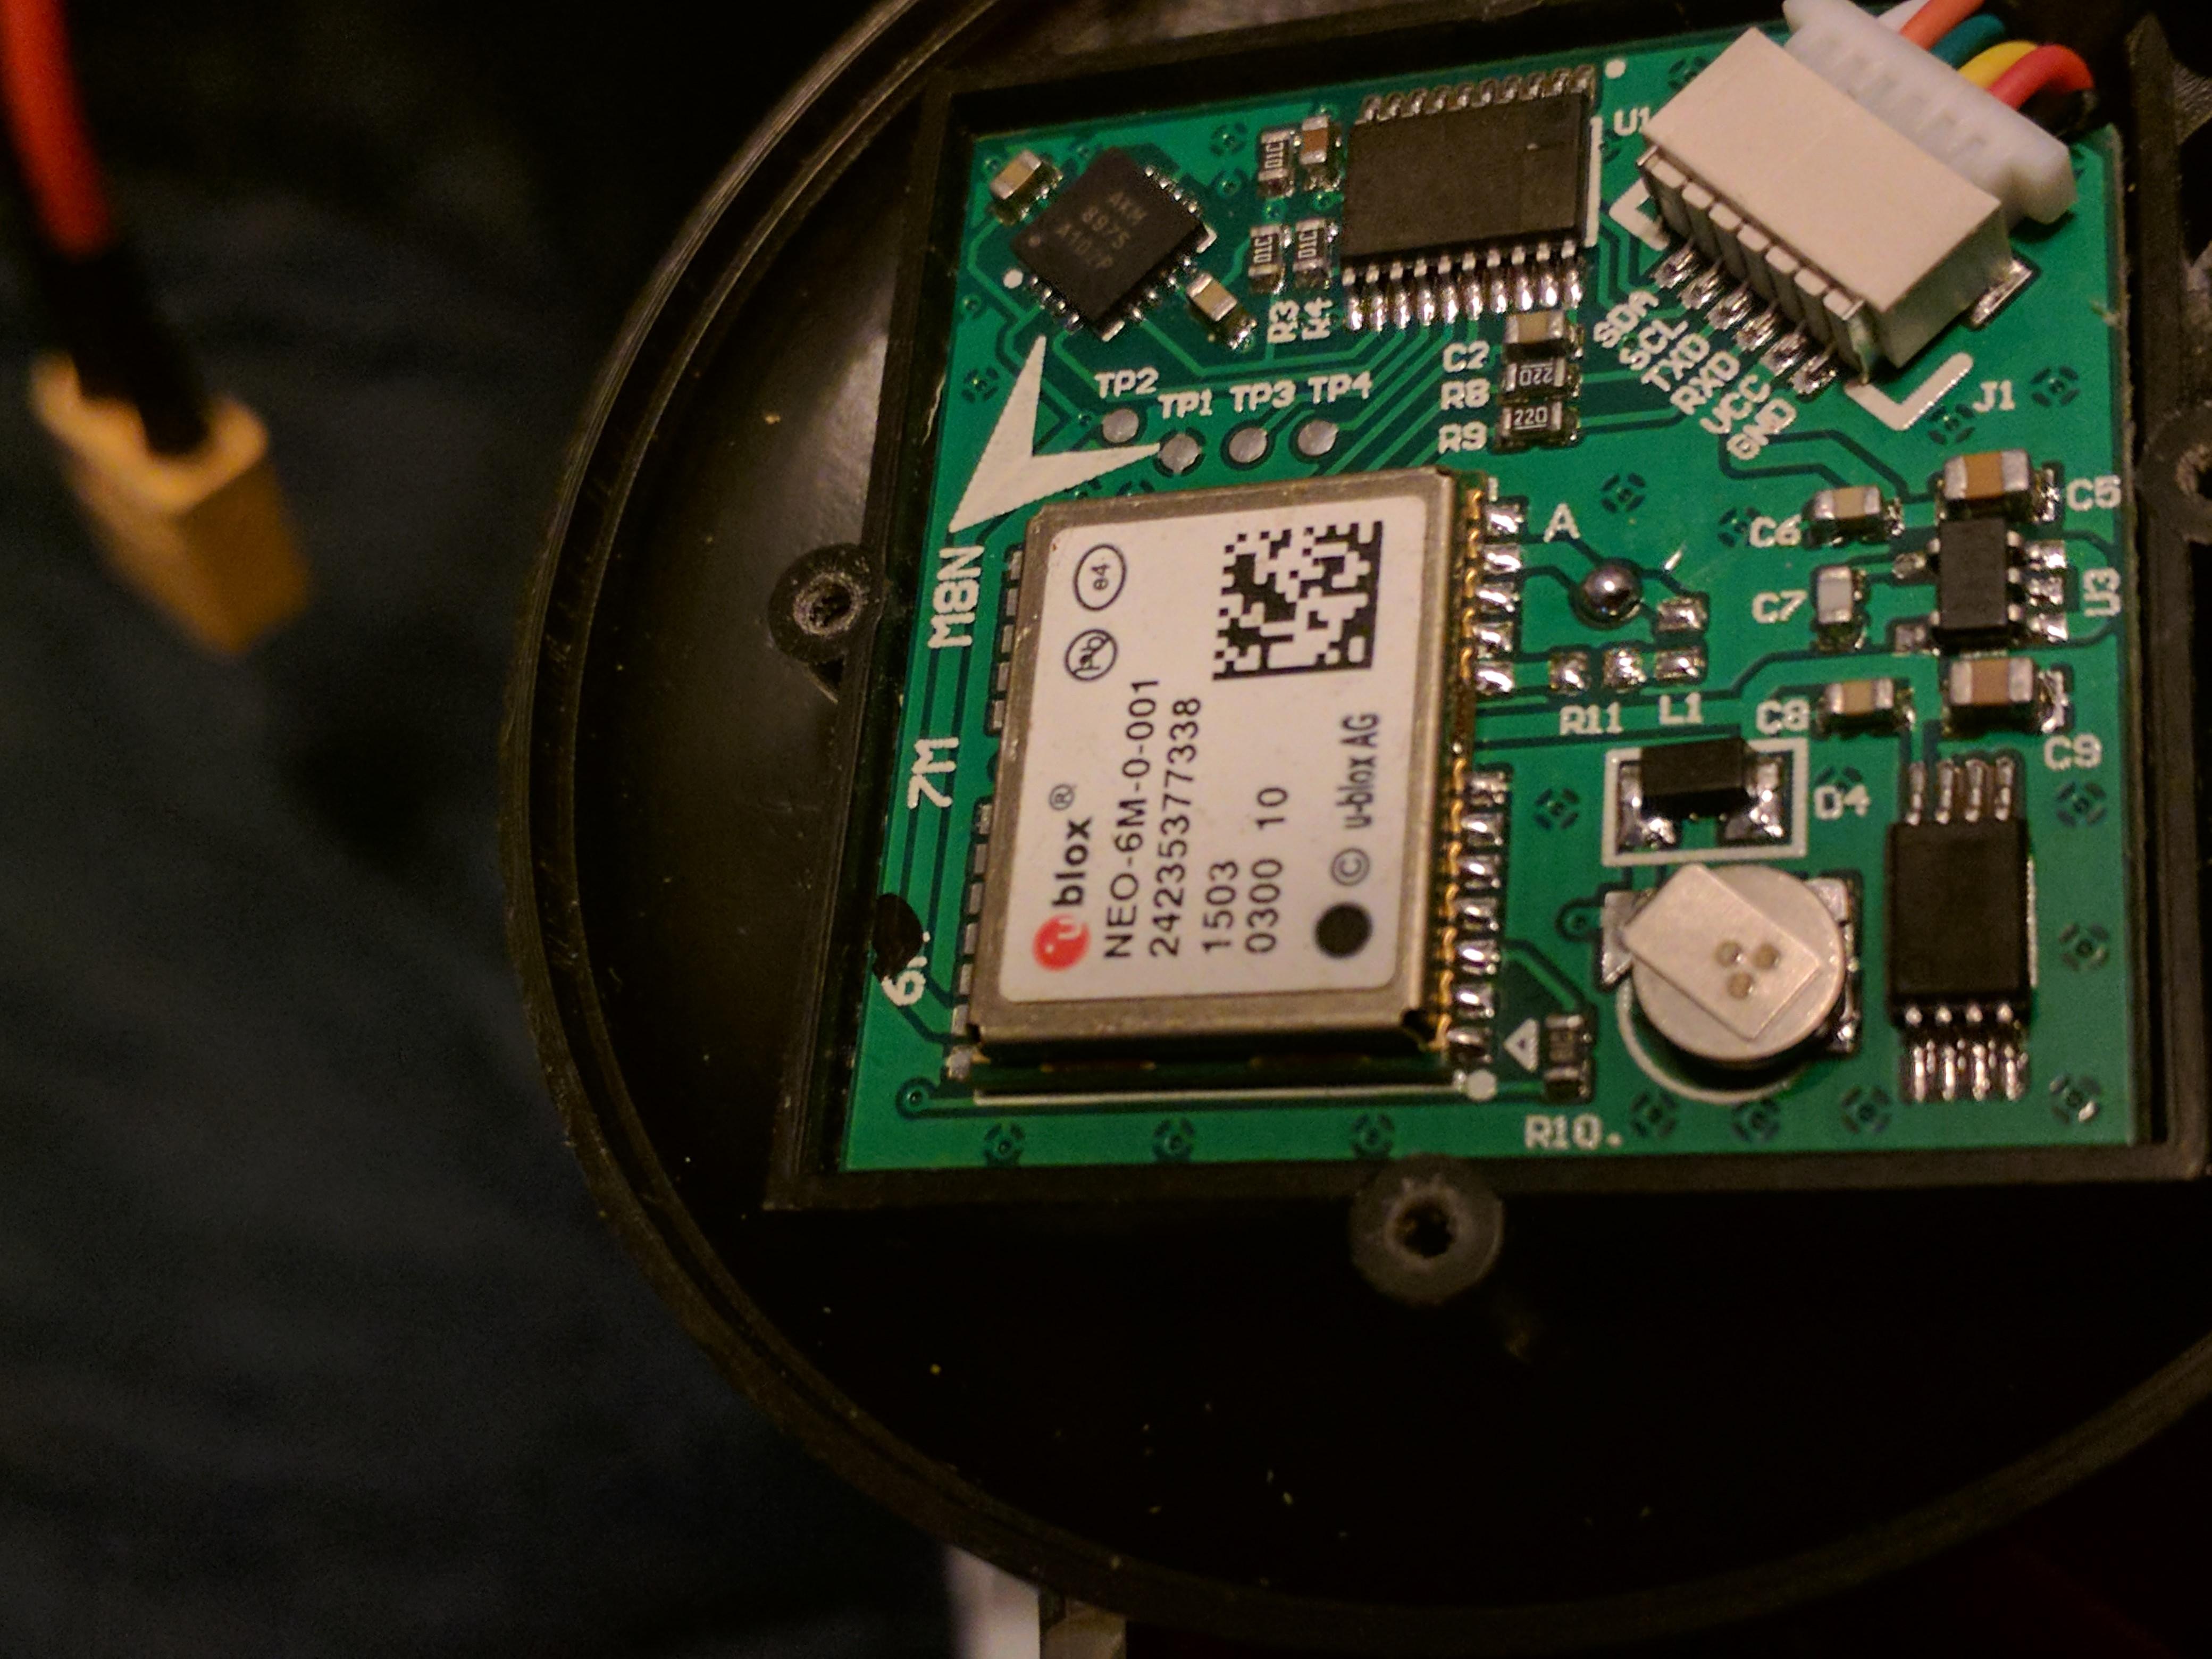 MAG AKM8975 being detected as HMC5883 with crazy sensor